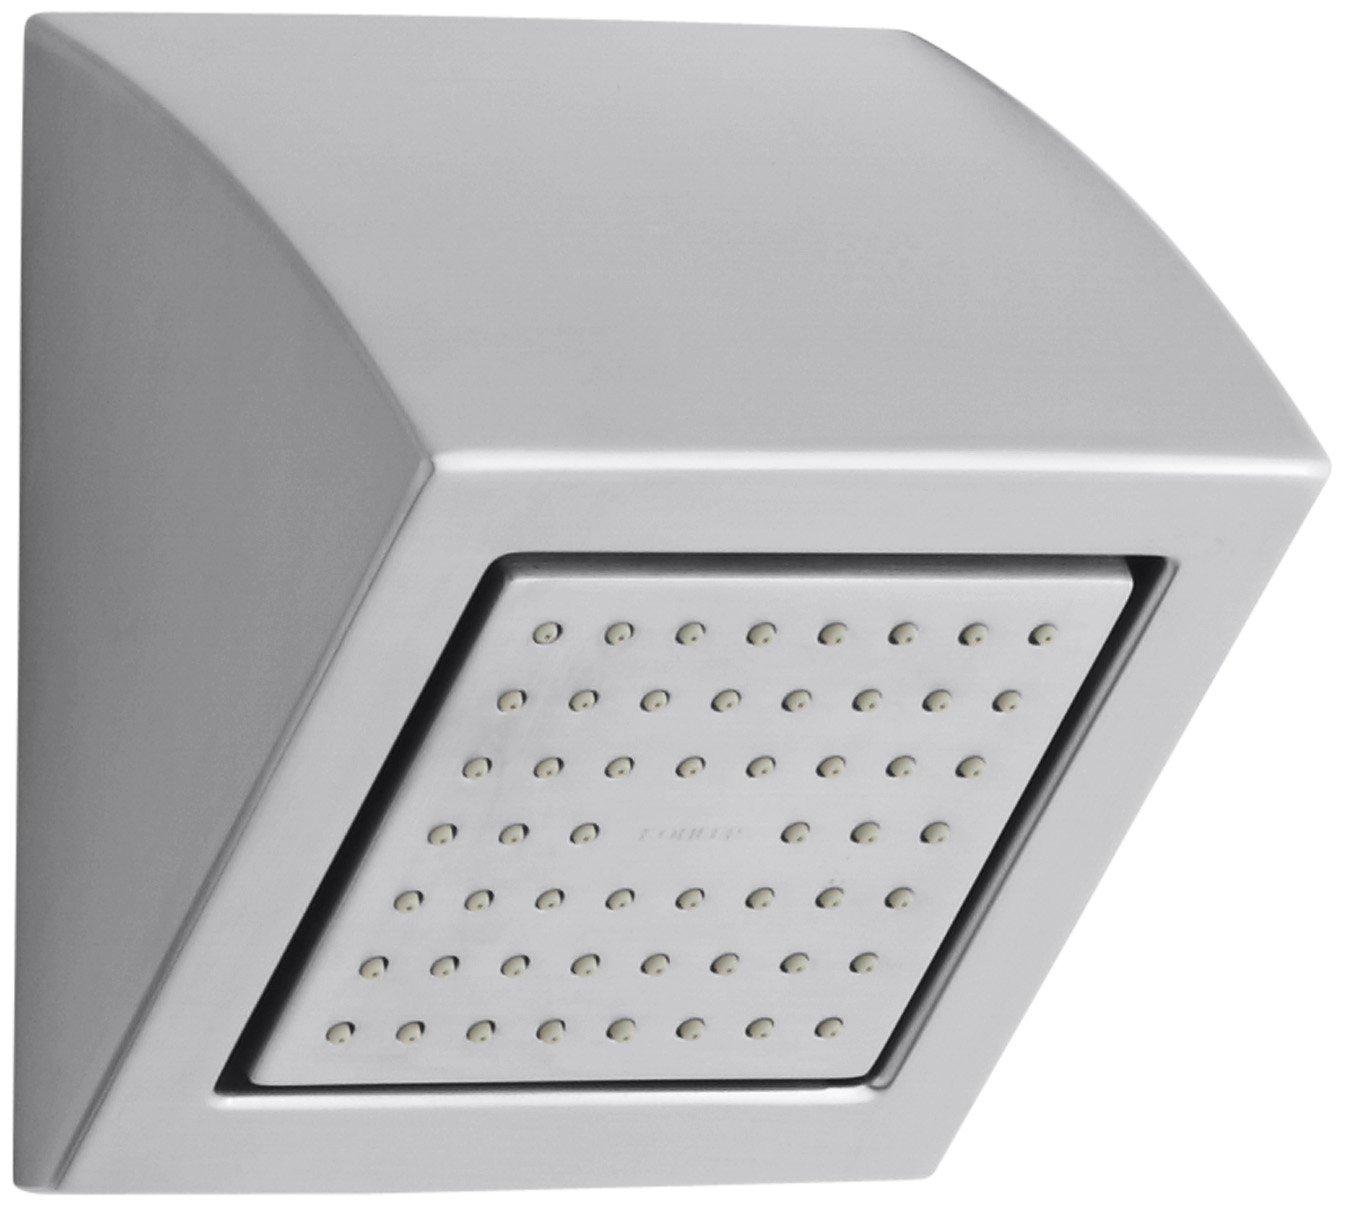 KOHLER K-8022-CP WaterTile 54-Nozzle Showerhead, Polished Chrome ...